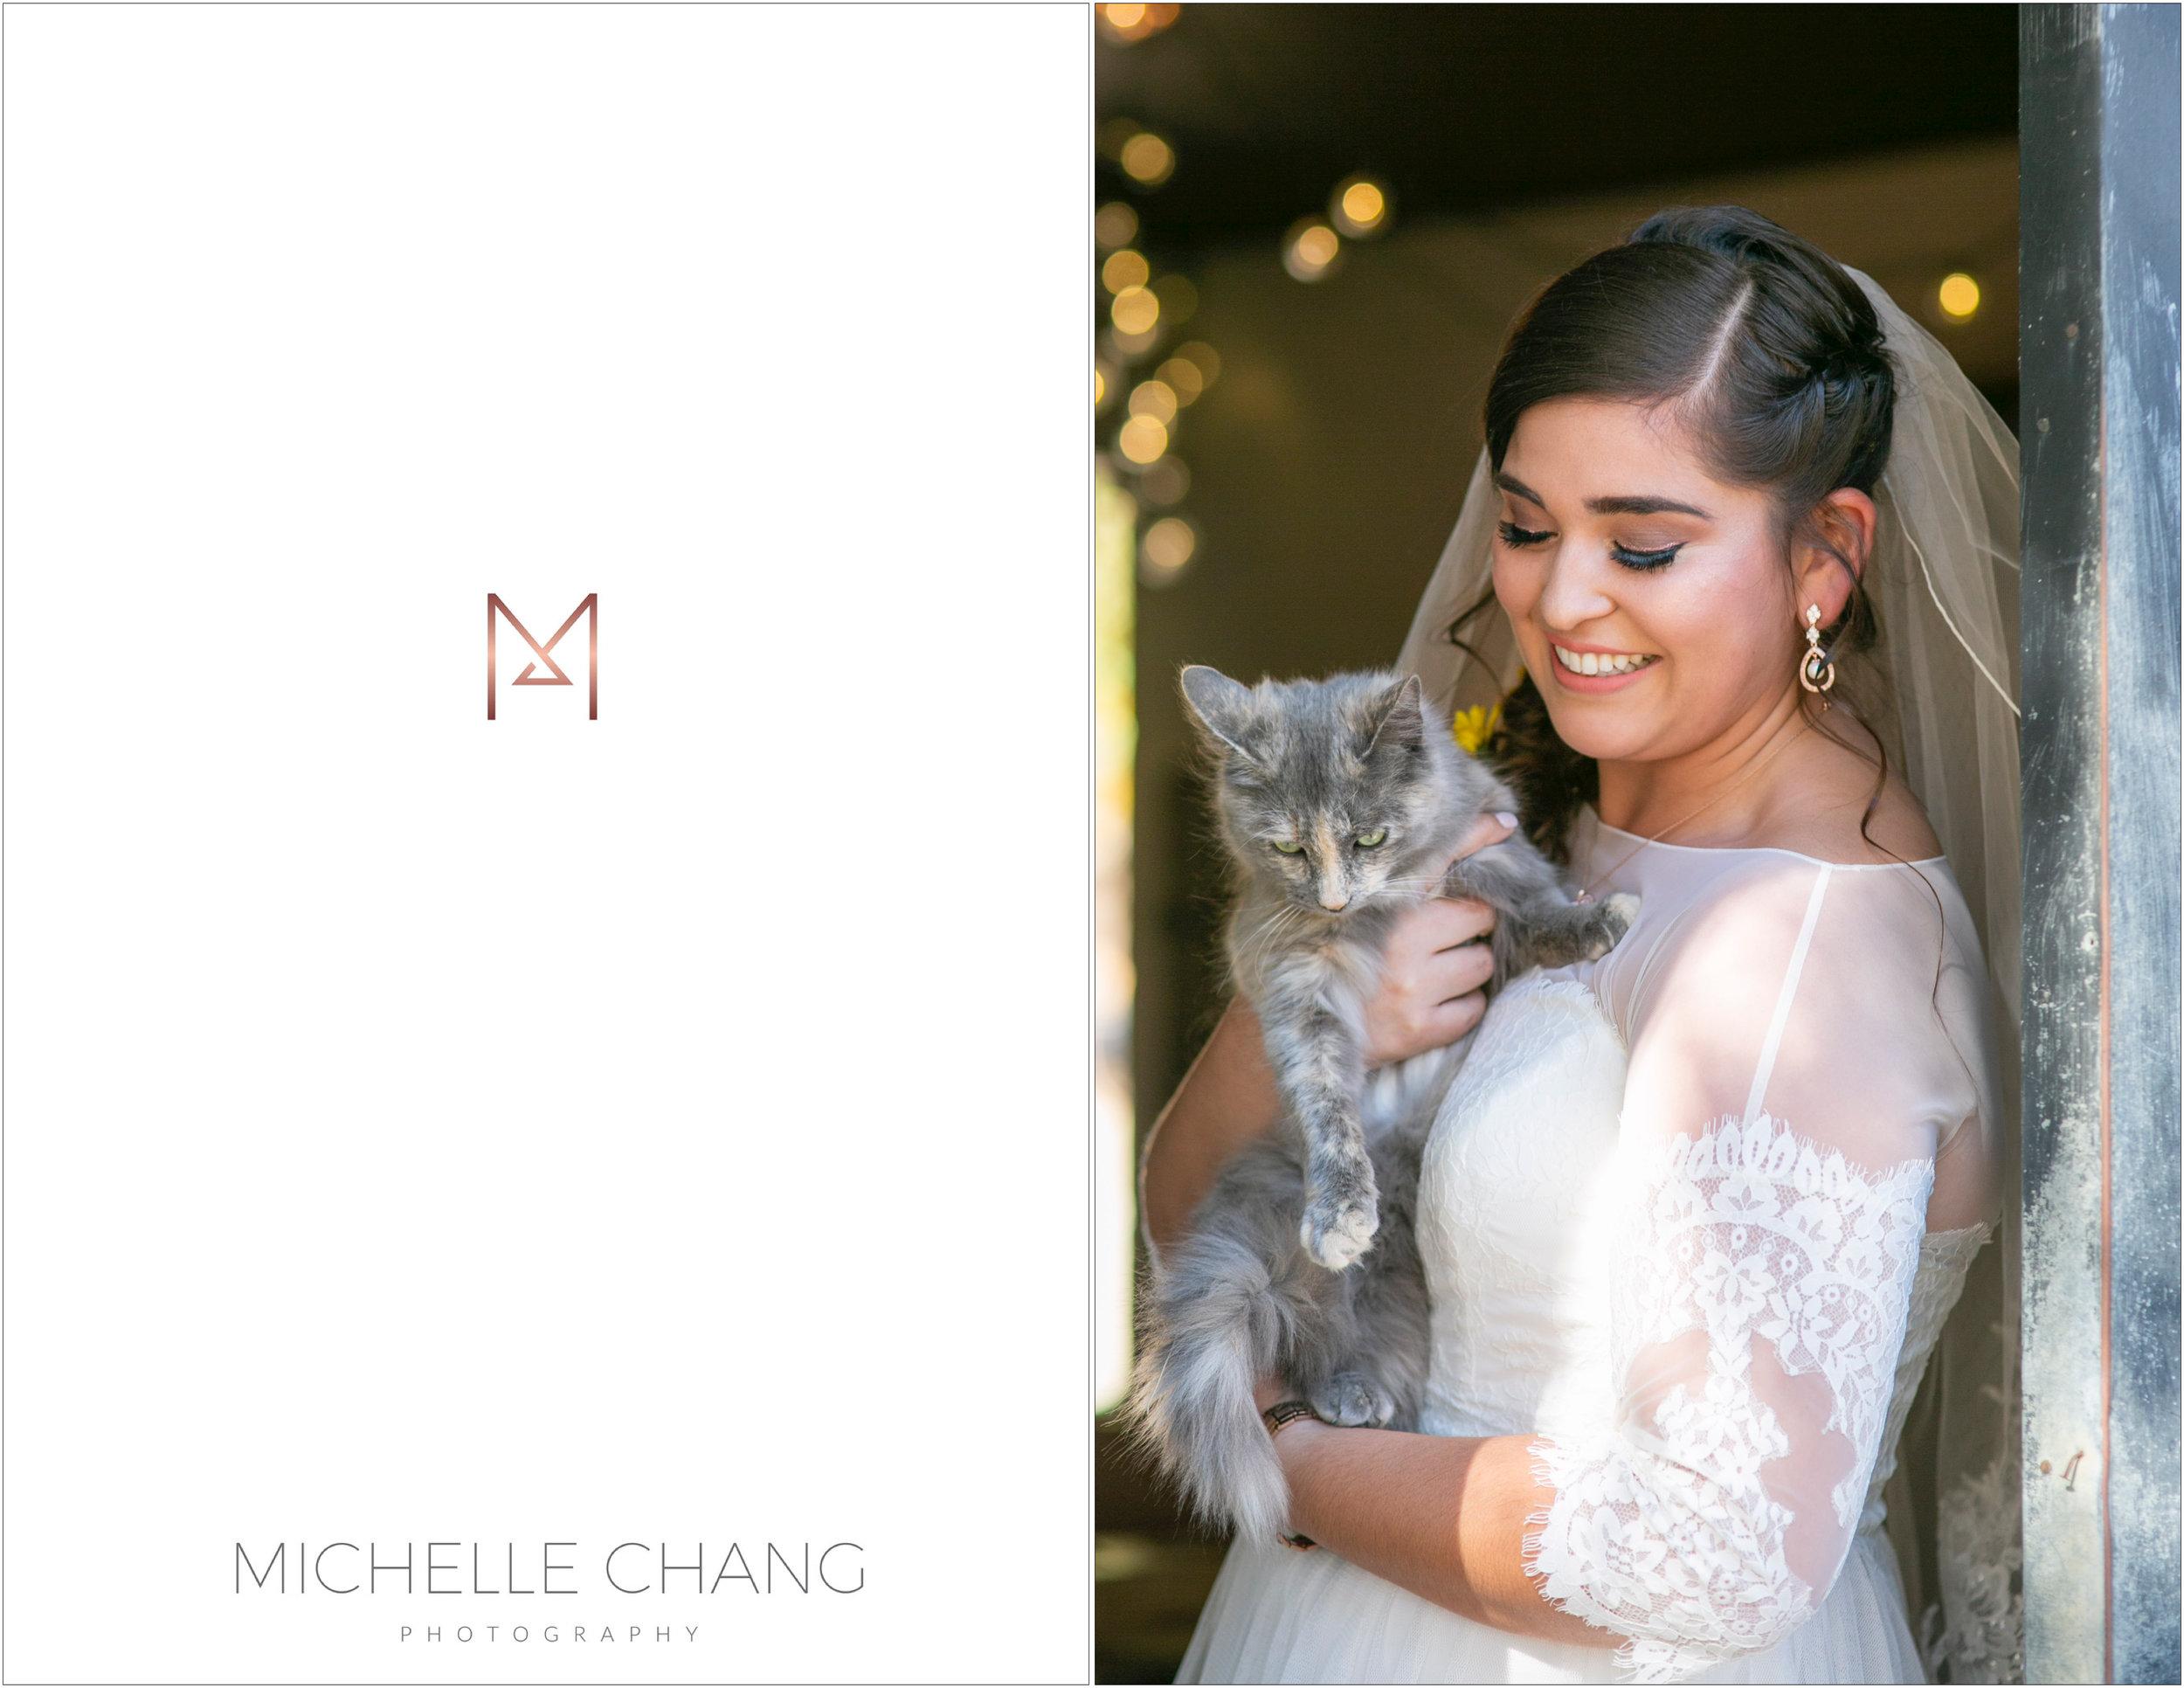 Bar SZ Ranch Wedding - Michelle Chang Photography